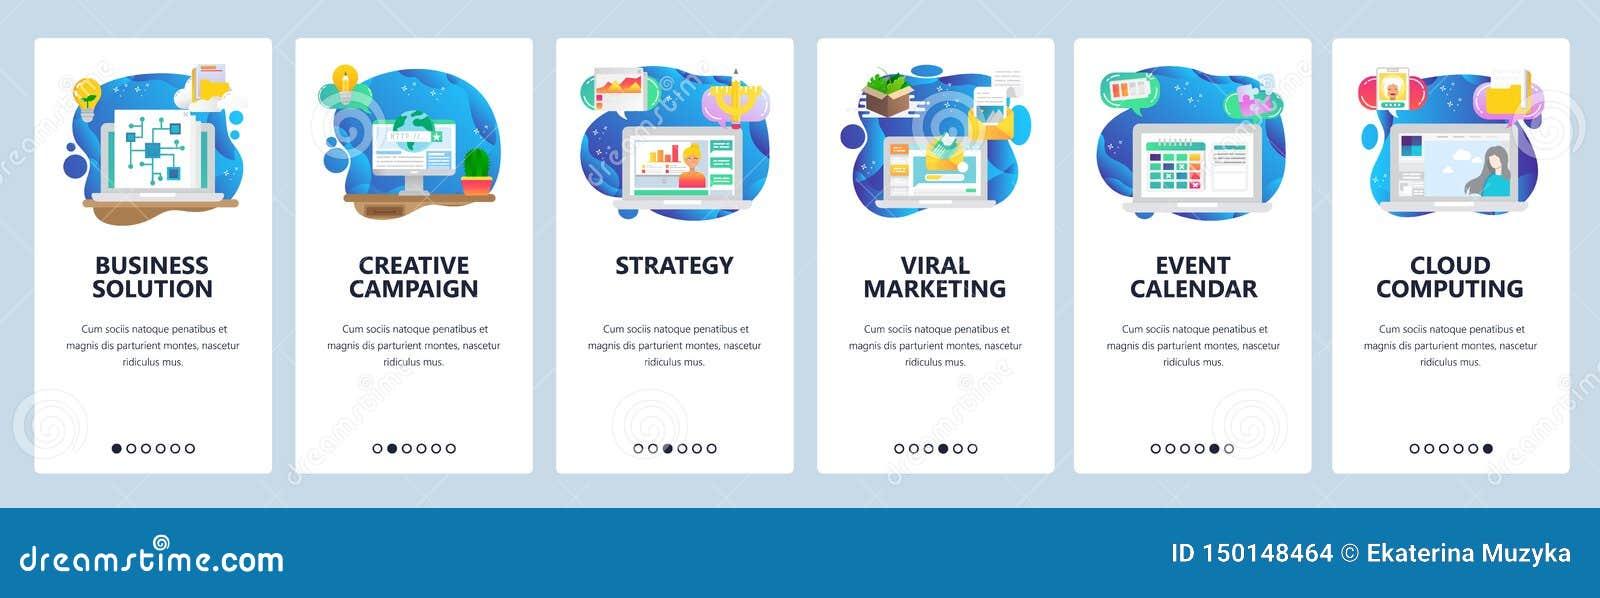 De mobiele toepassing onboarding schermen businessplan en strategie, virale marketing, e-mail, gebeurteniskalender Menu vectorban